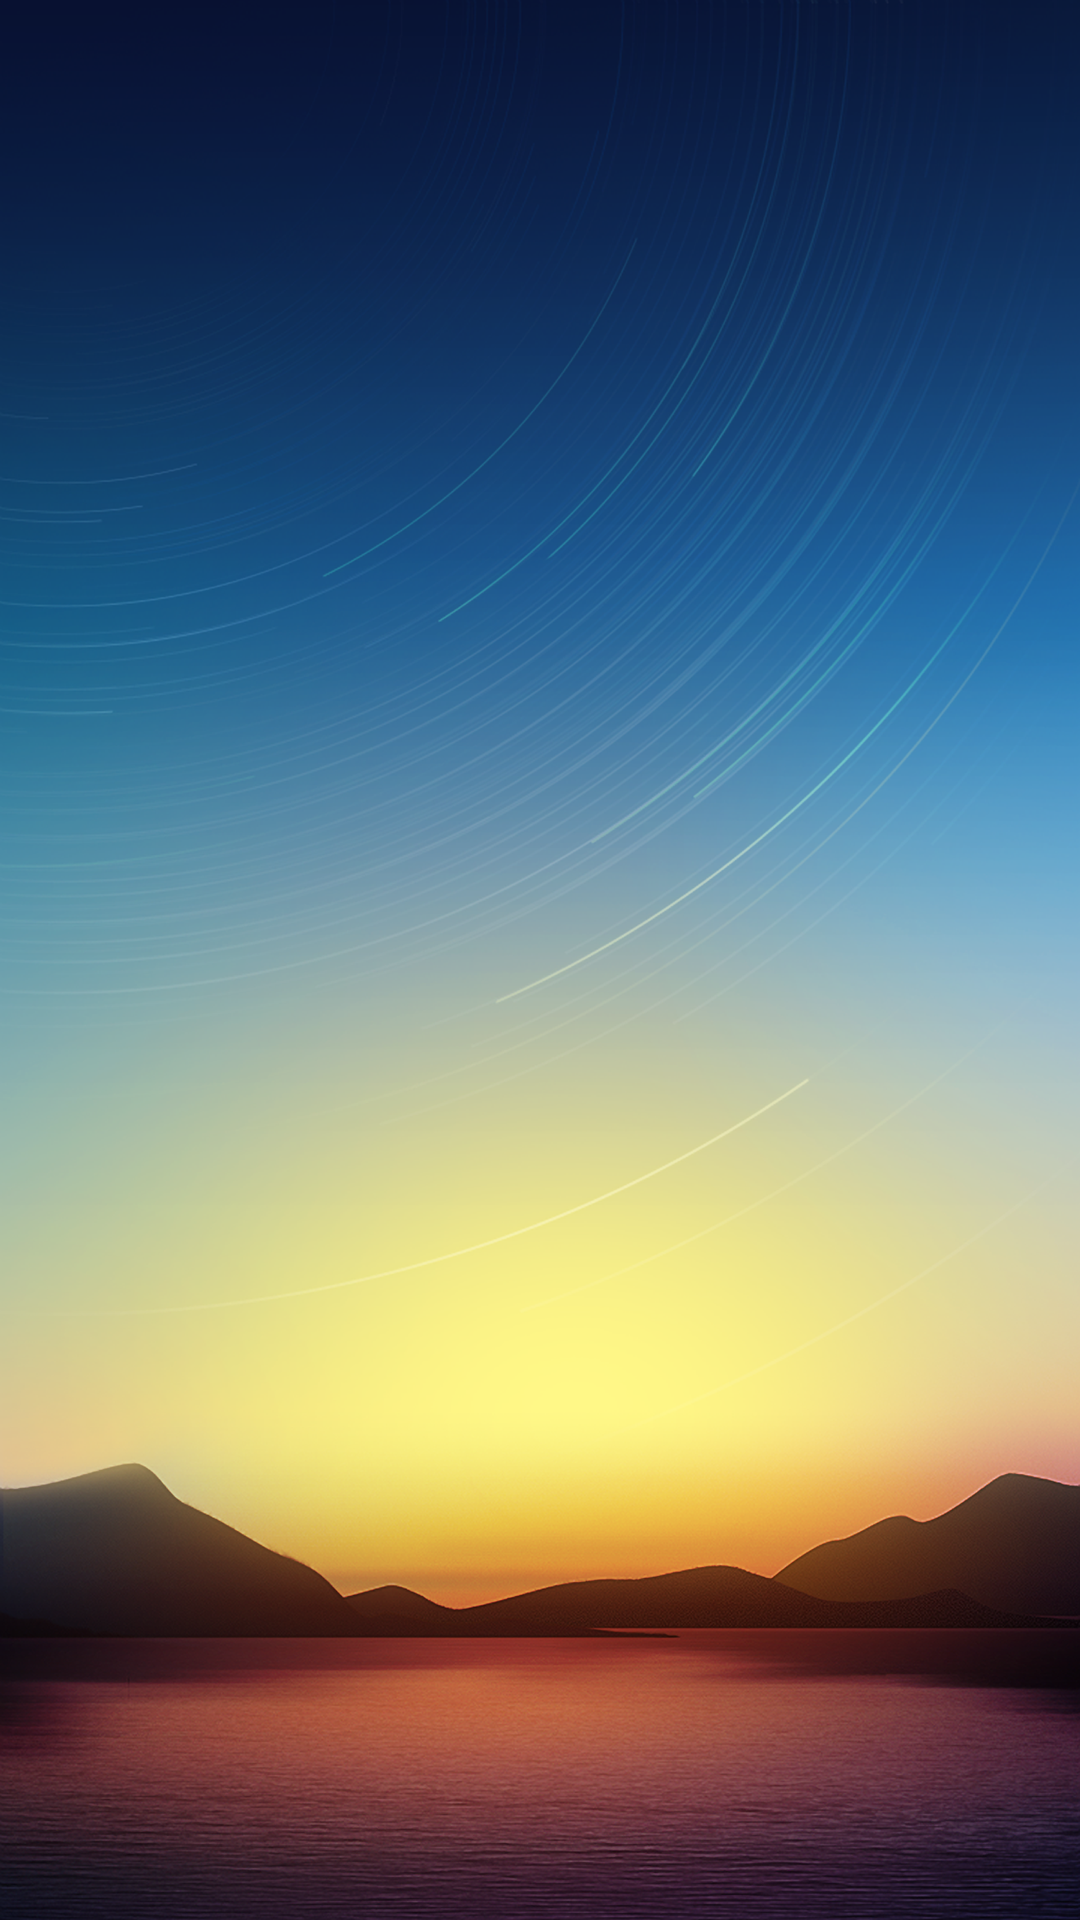 Windows phone wallpapers best windows phone 7 wallpapers - Hd Phone Wallpapers